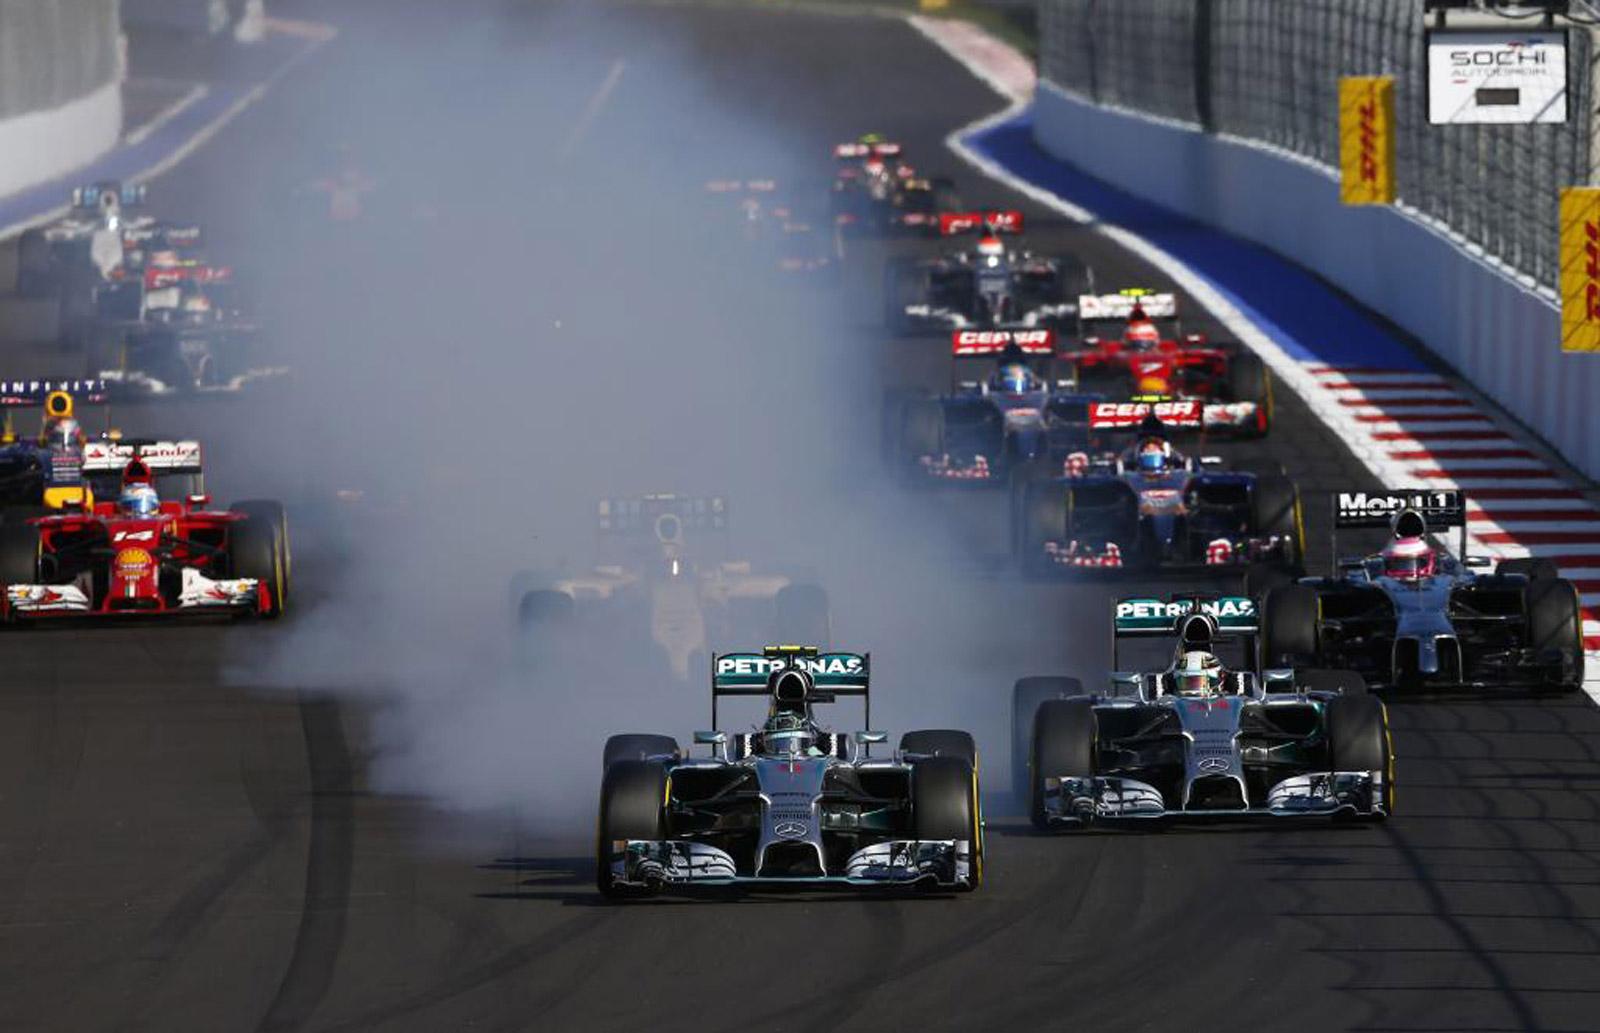 2014 Formula One Russian Grand Prix Results